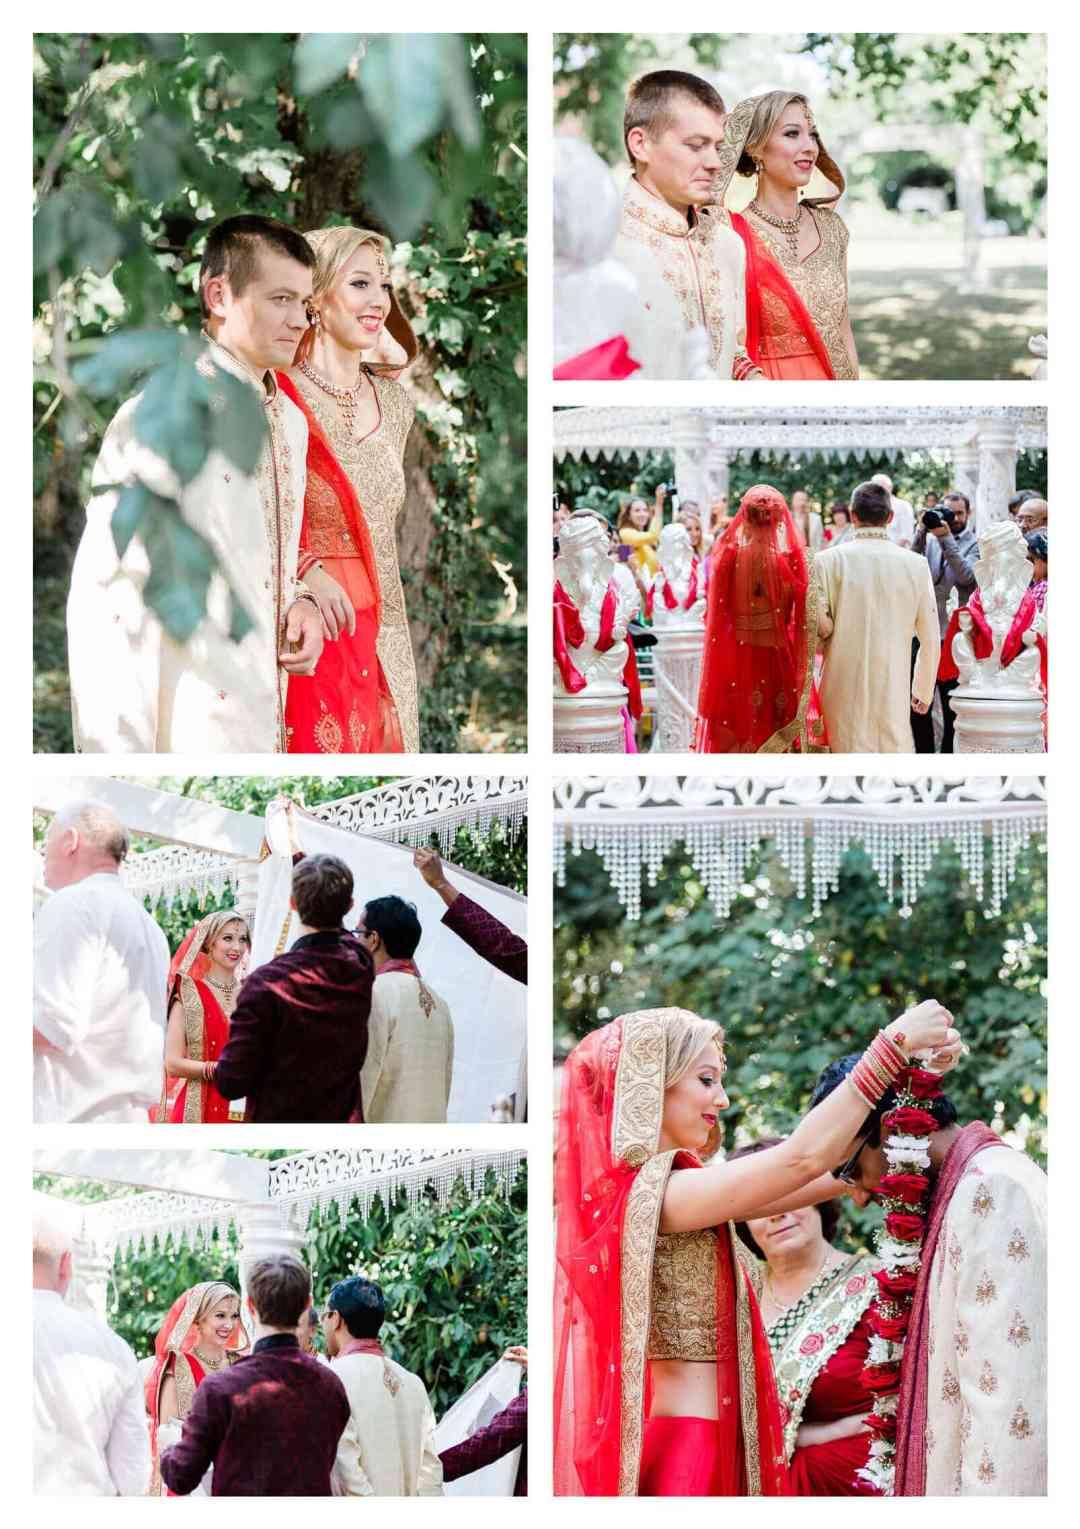 Baddow Park Hindu wedding ceremony | Essex wedding photographer